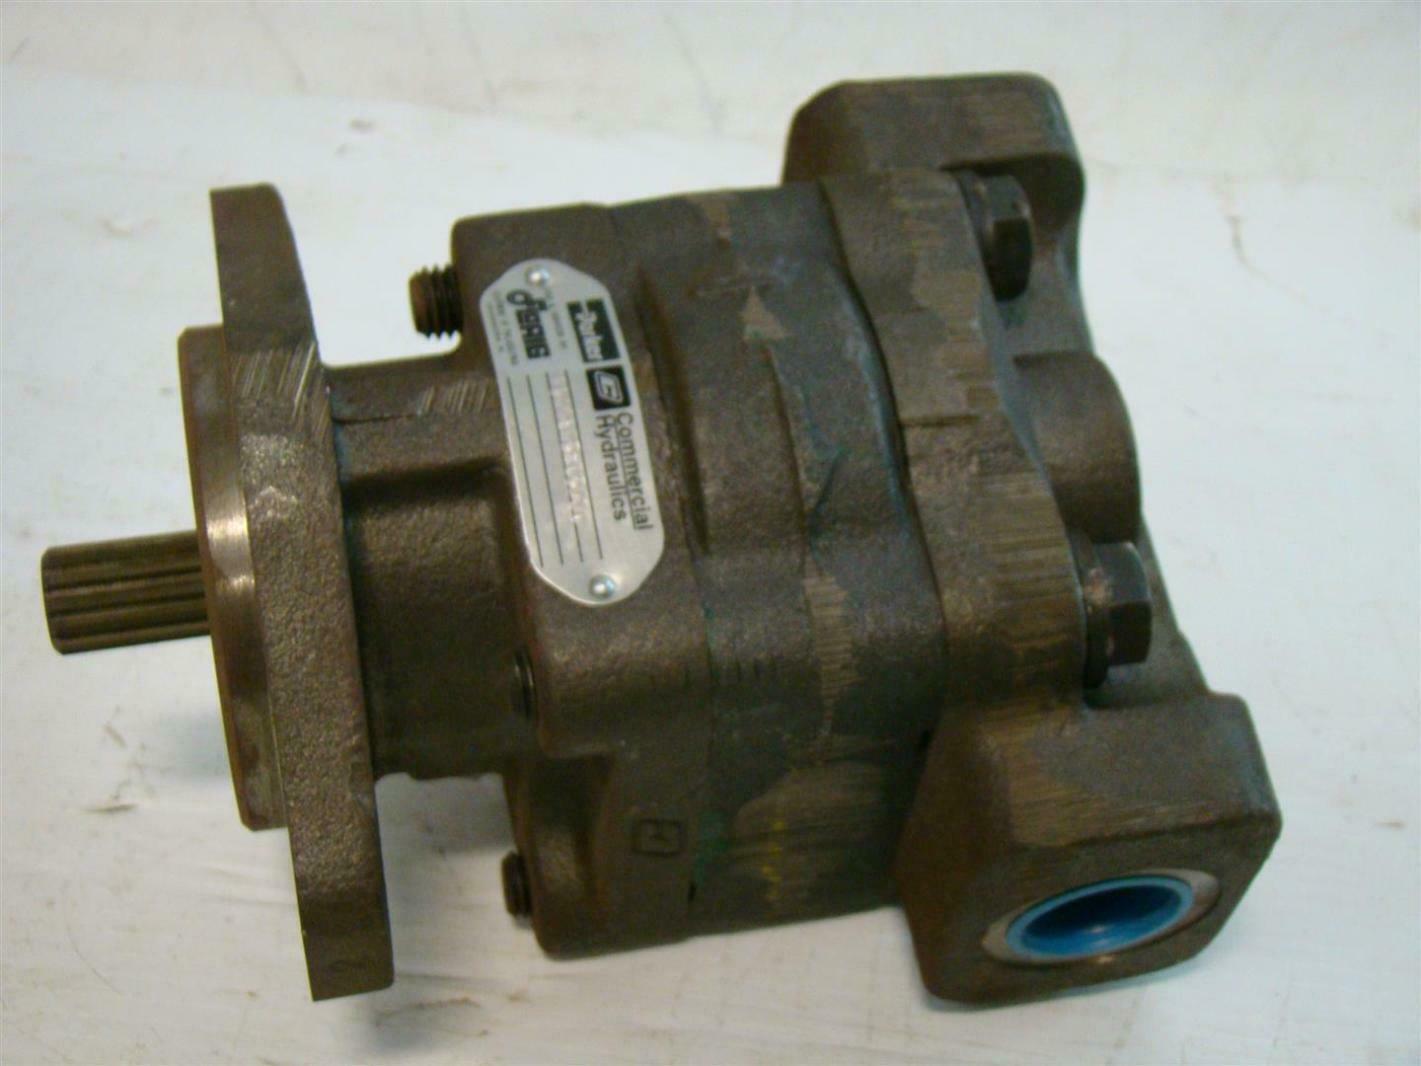 Florig parker commercial hydraulics pump 1 1 4 p244942 ebay for Parker pumps and motors